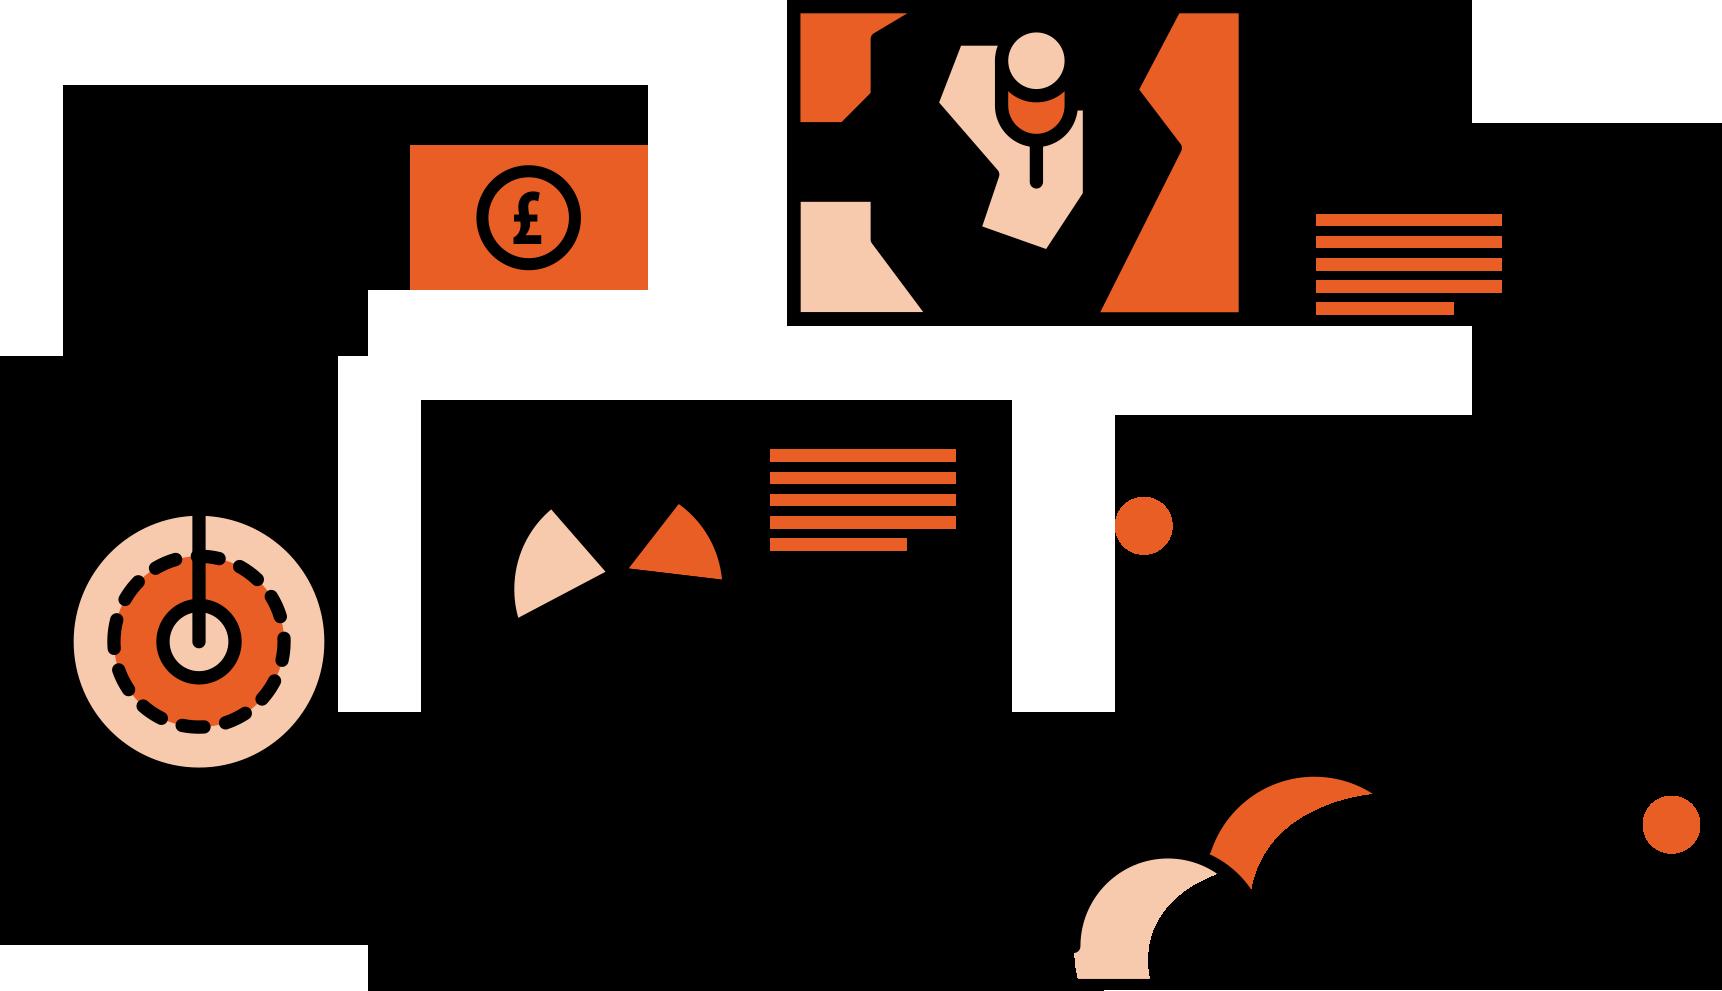 Contractor clipart business. Orange genie accountancy vs